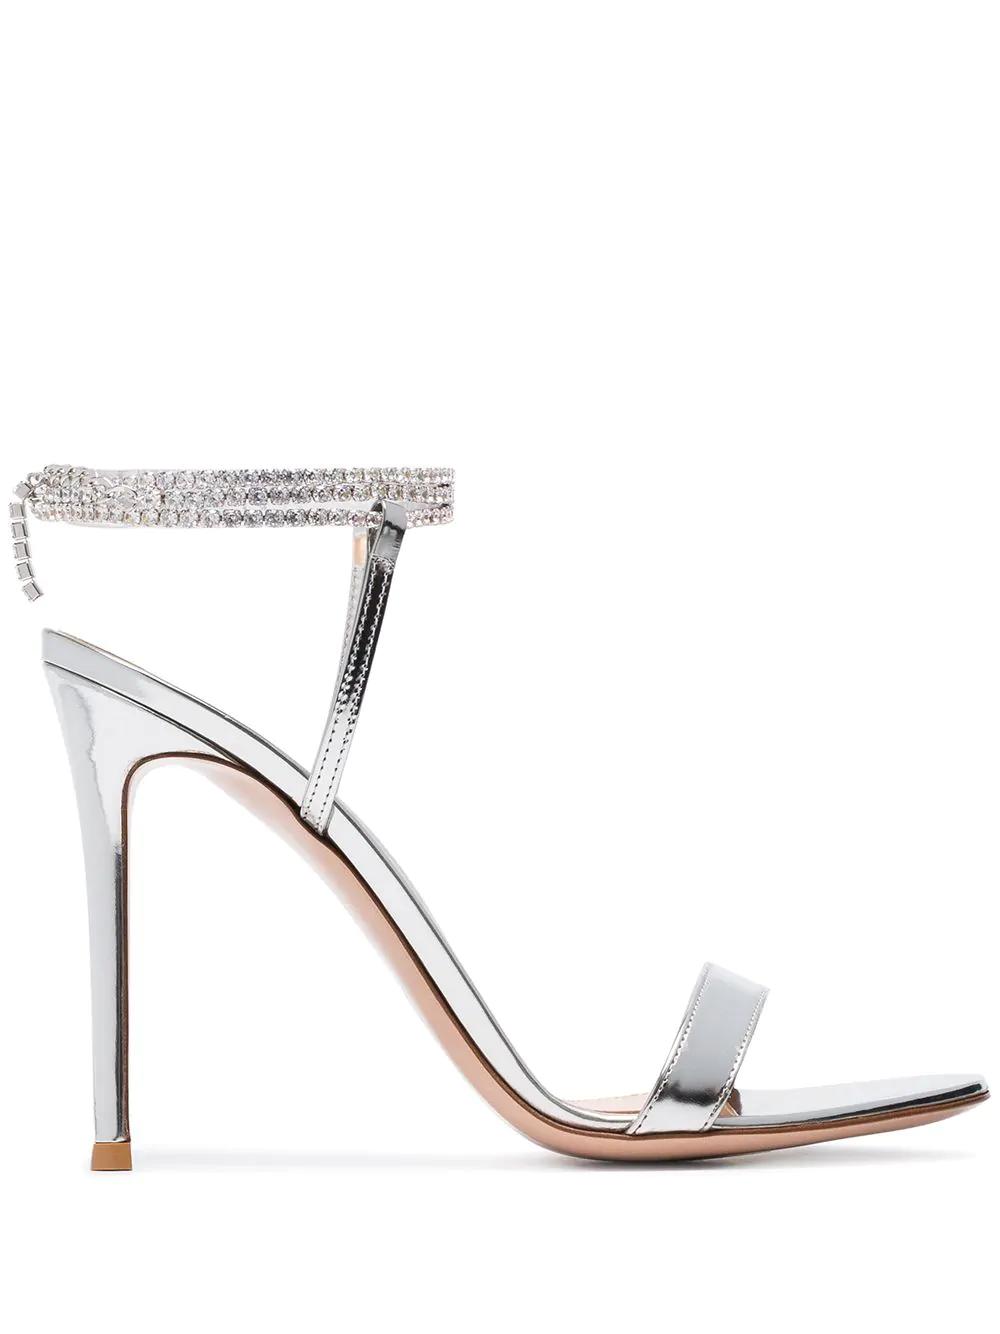 1933ae7b2d7 Gianvito Rossi Silver Tennis 105 Crystal Metallic Sandals